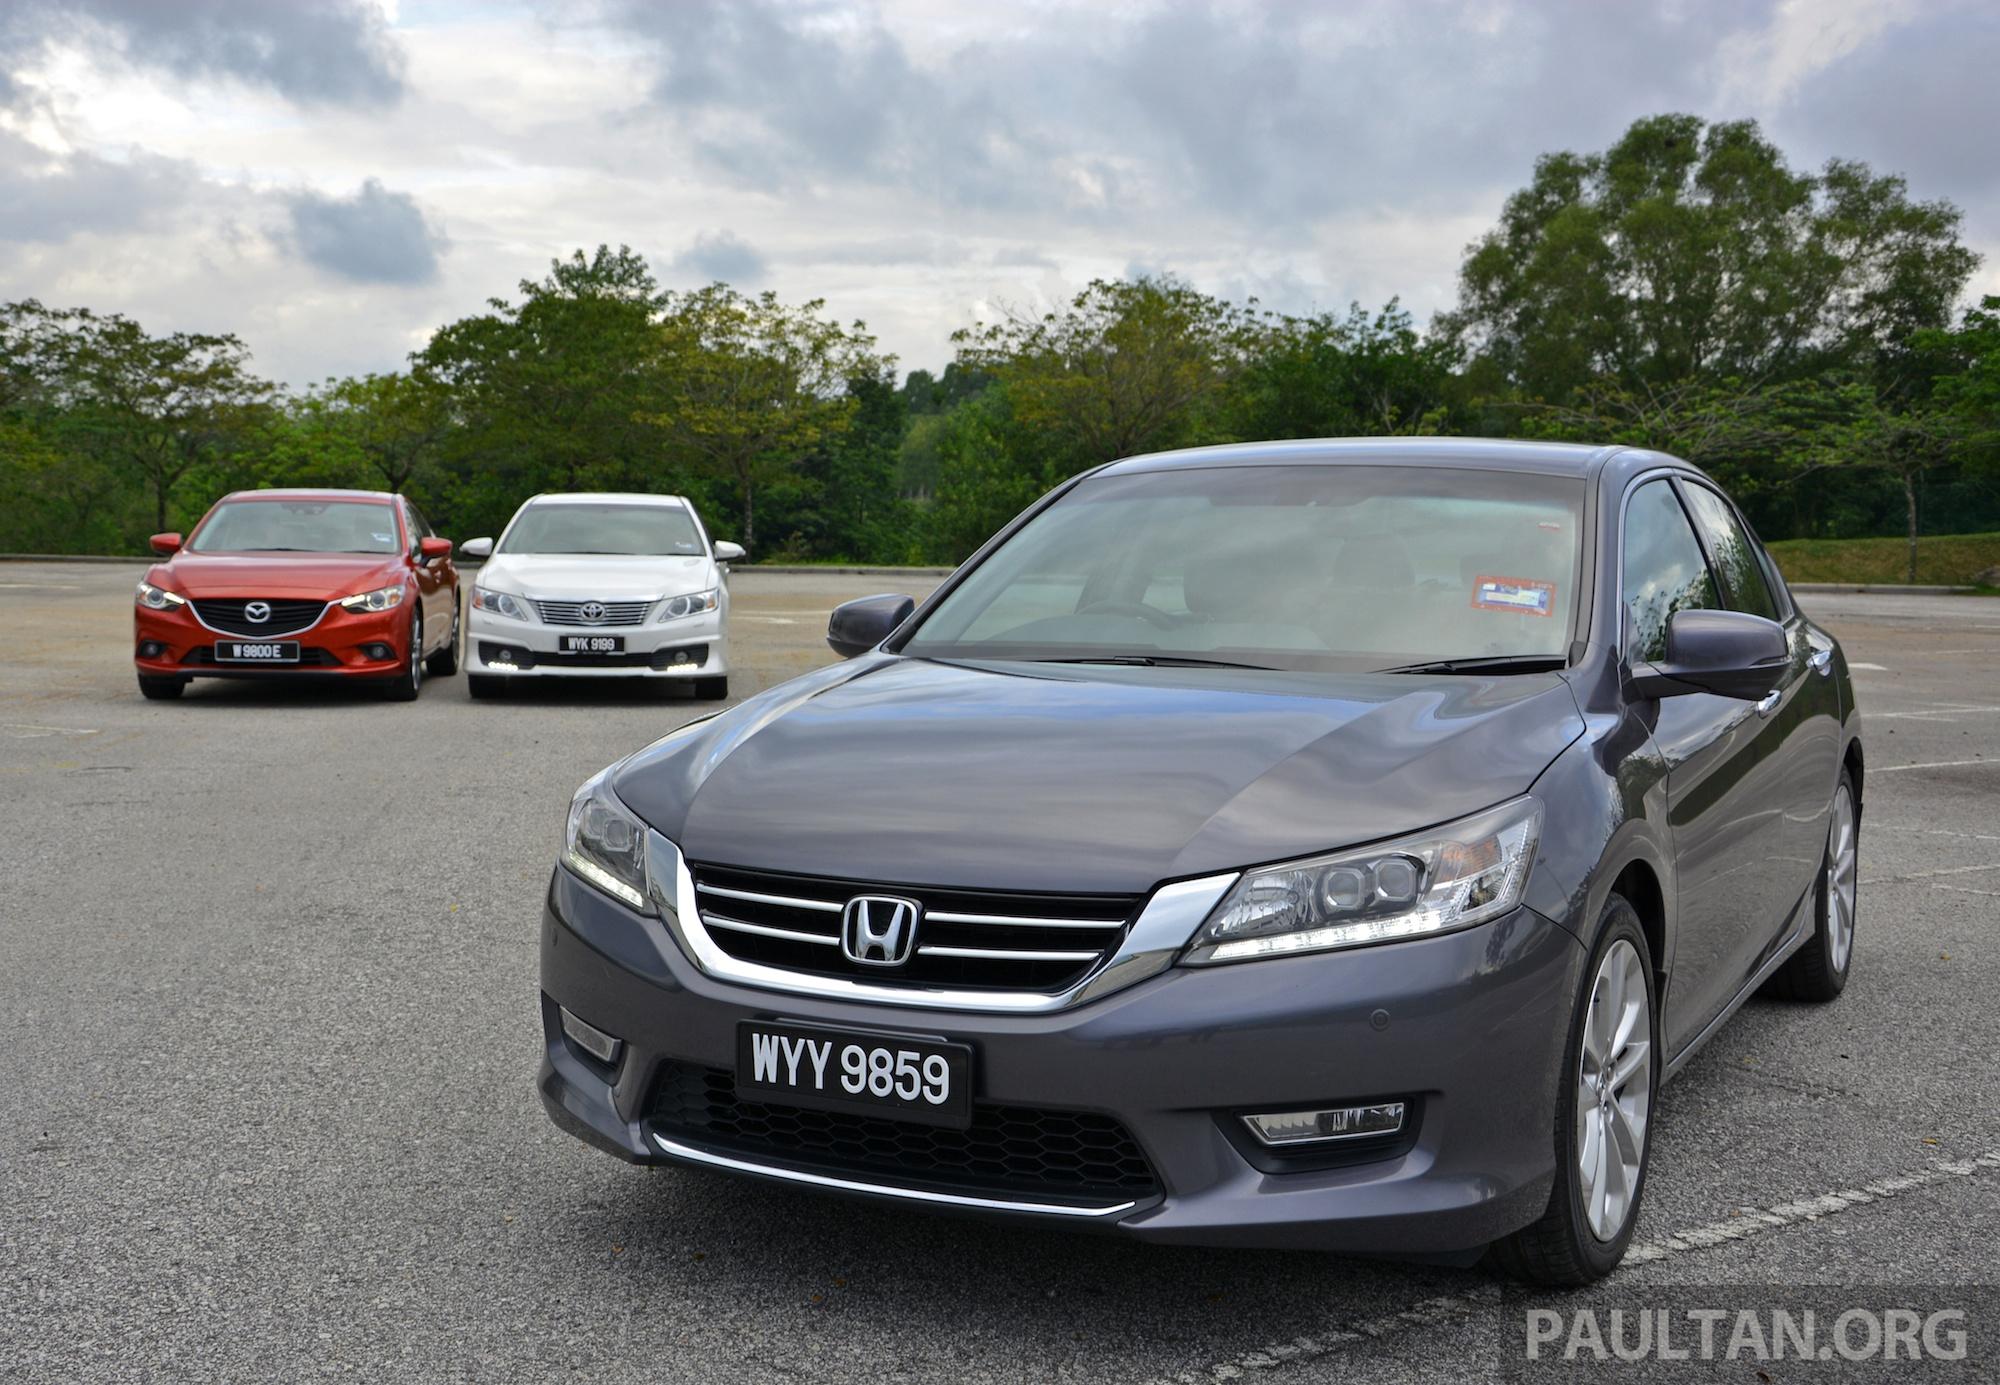 Toyota camry vs mazda 6 autos post for Mazda vs honda reliability